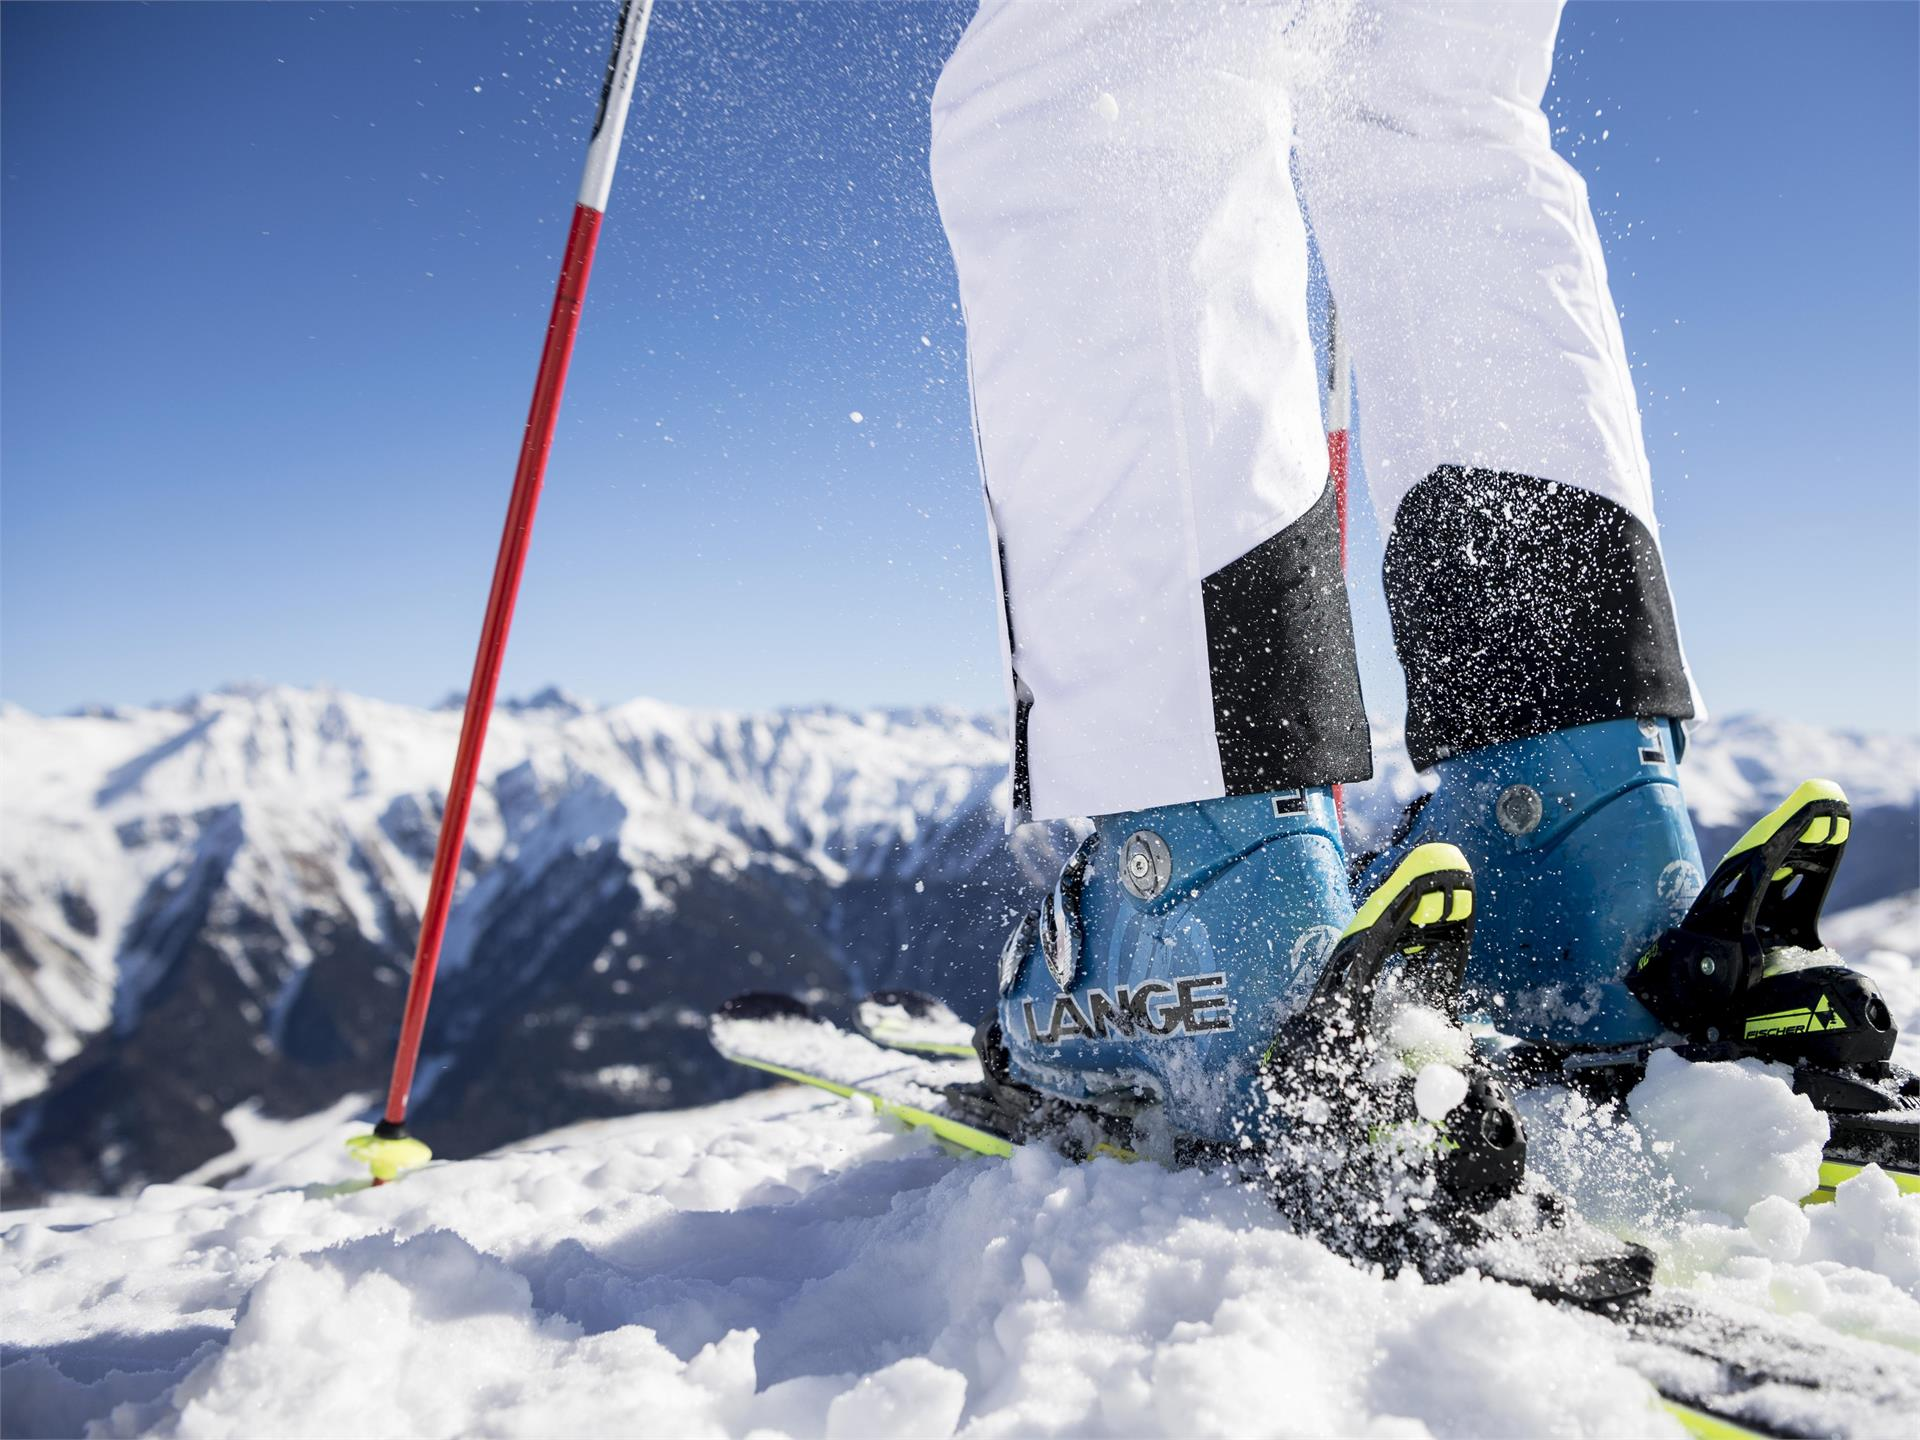 International giant slalom race